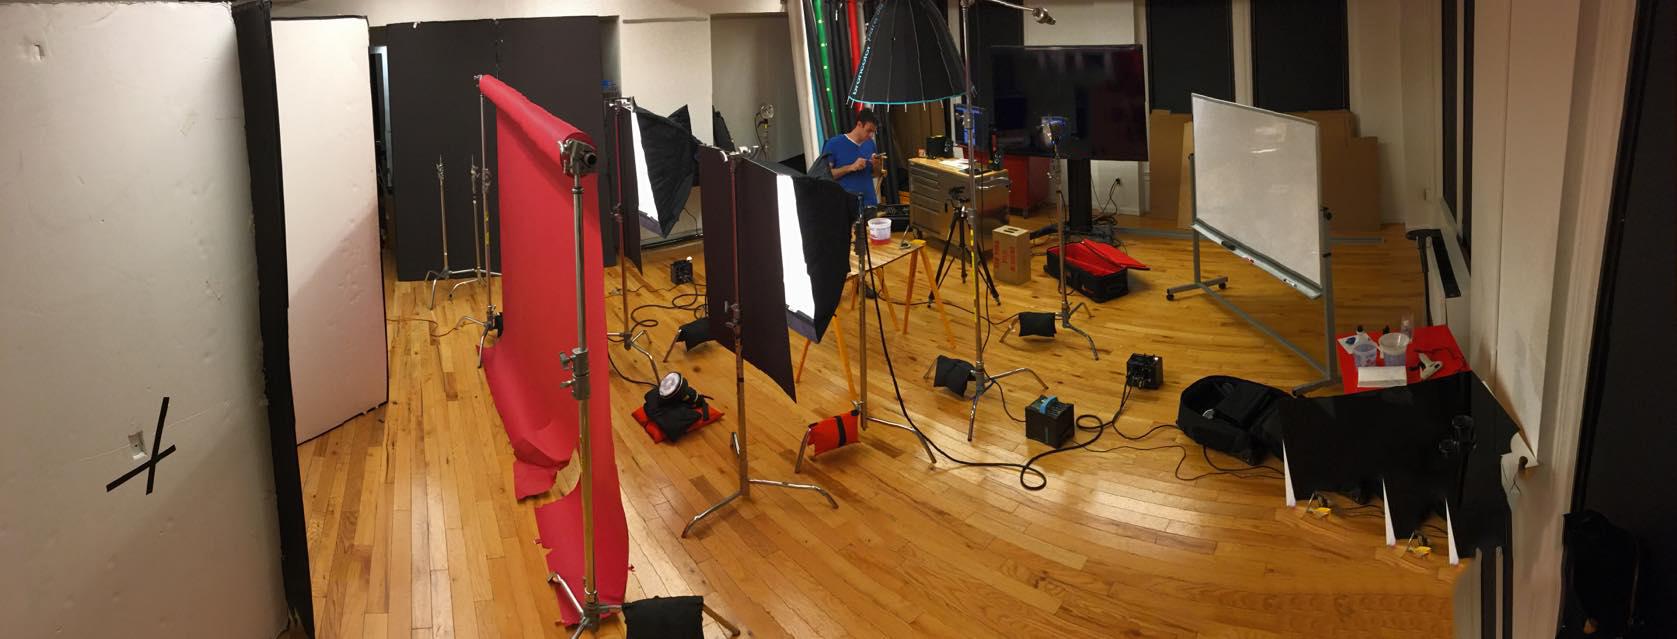 Studio Manhattan NYC